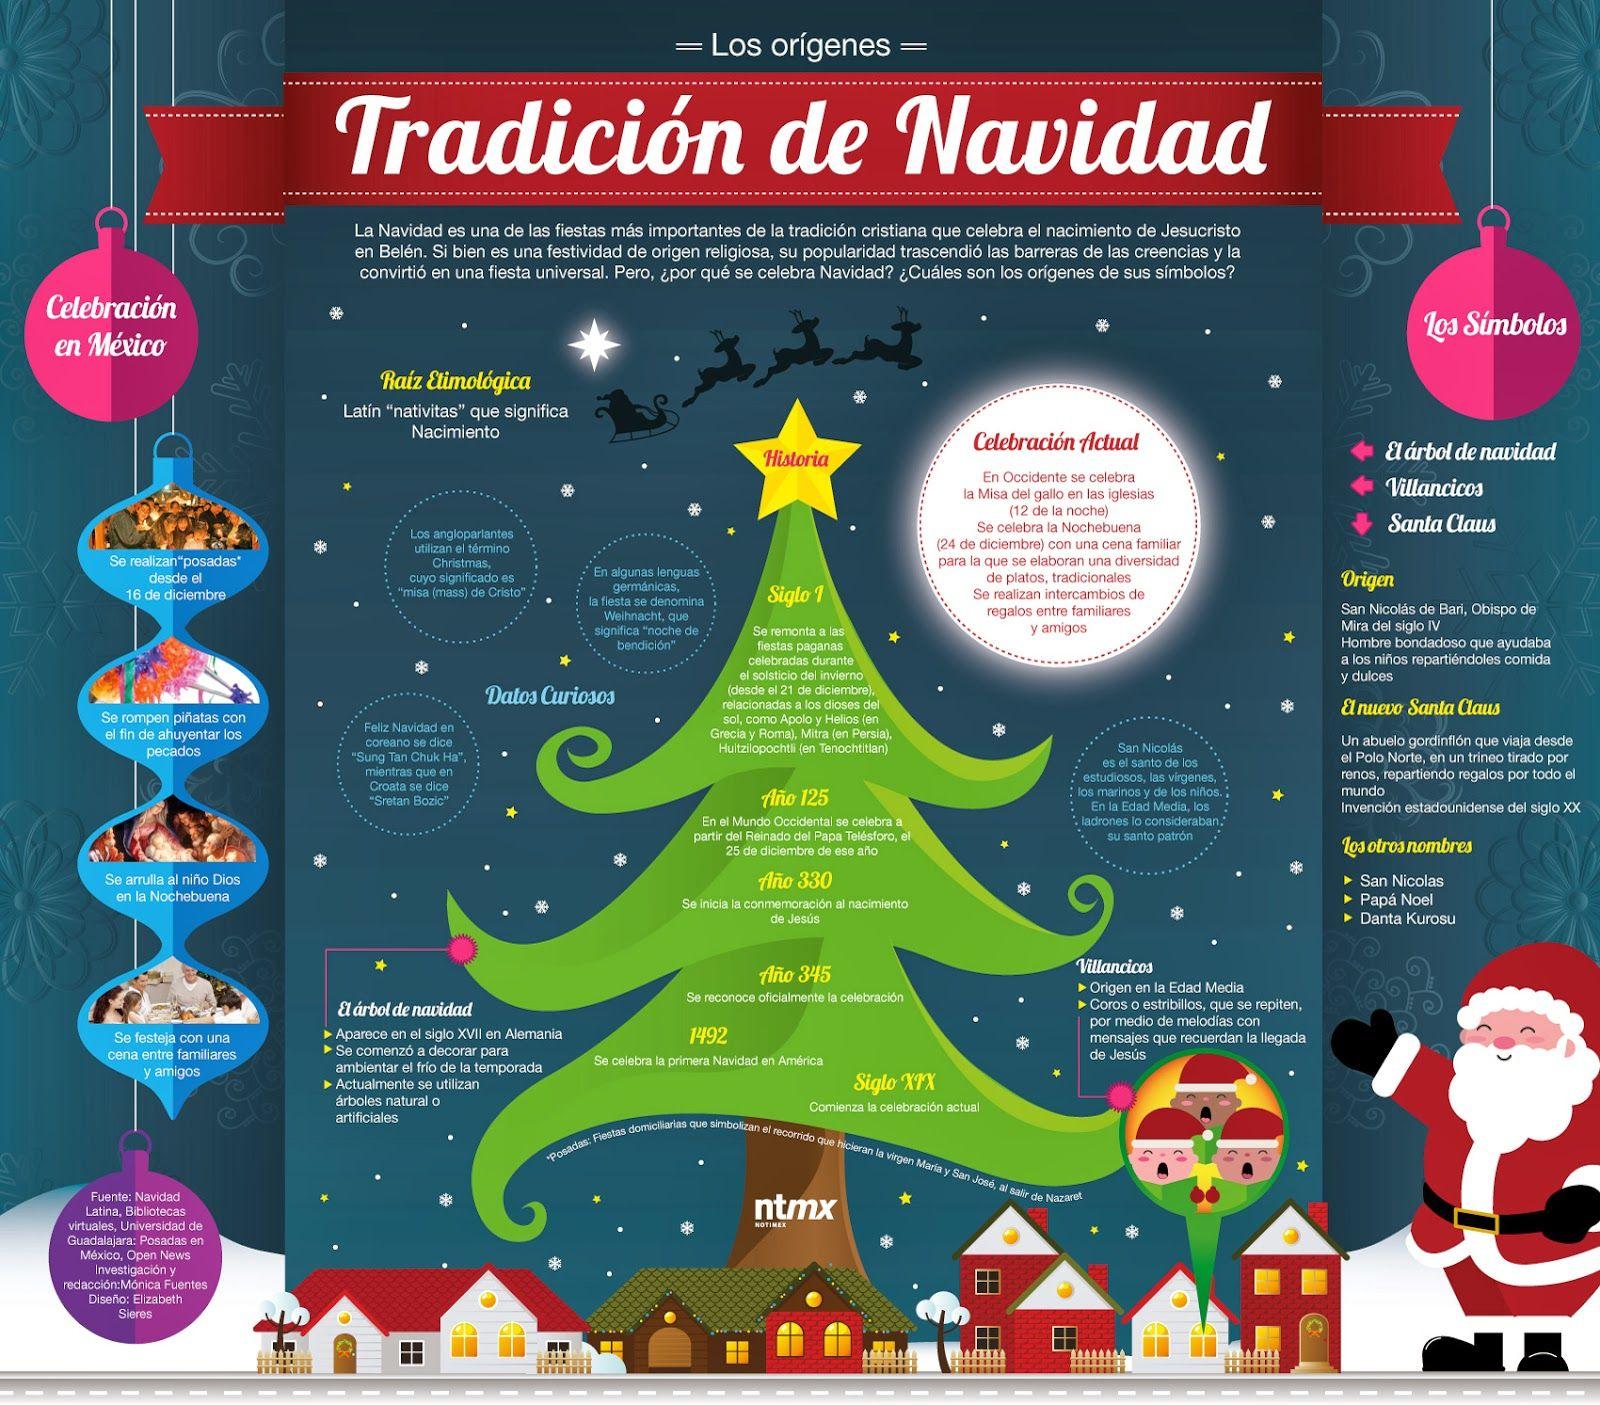 Los Origenes De La Tradicion De La Navidad Infografia Infographic